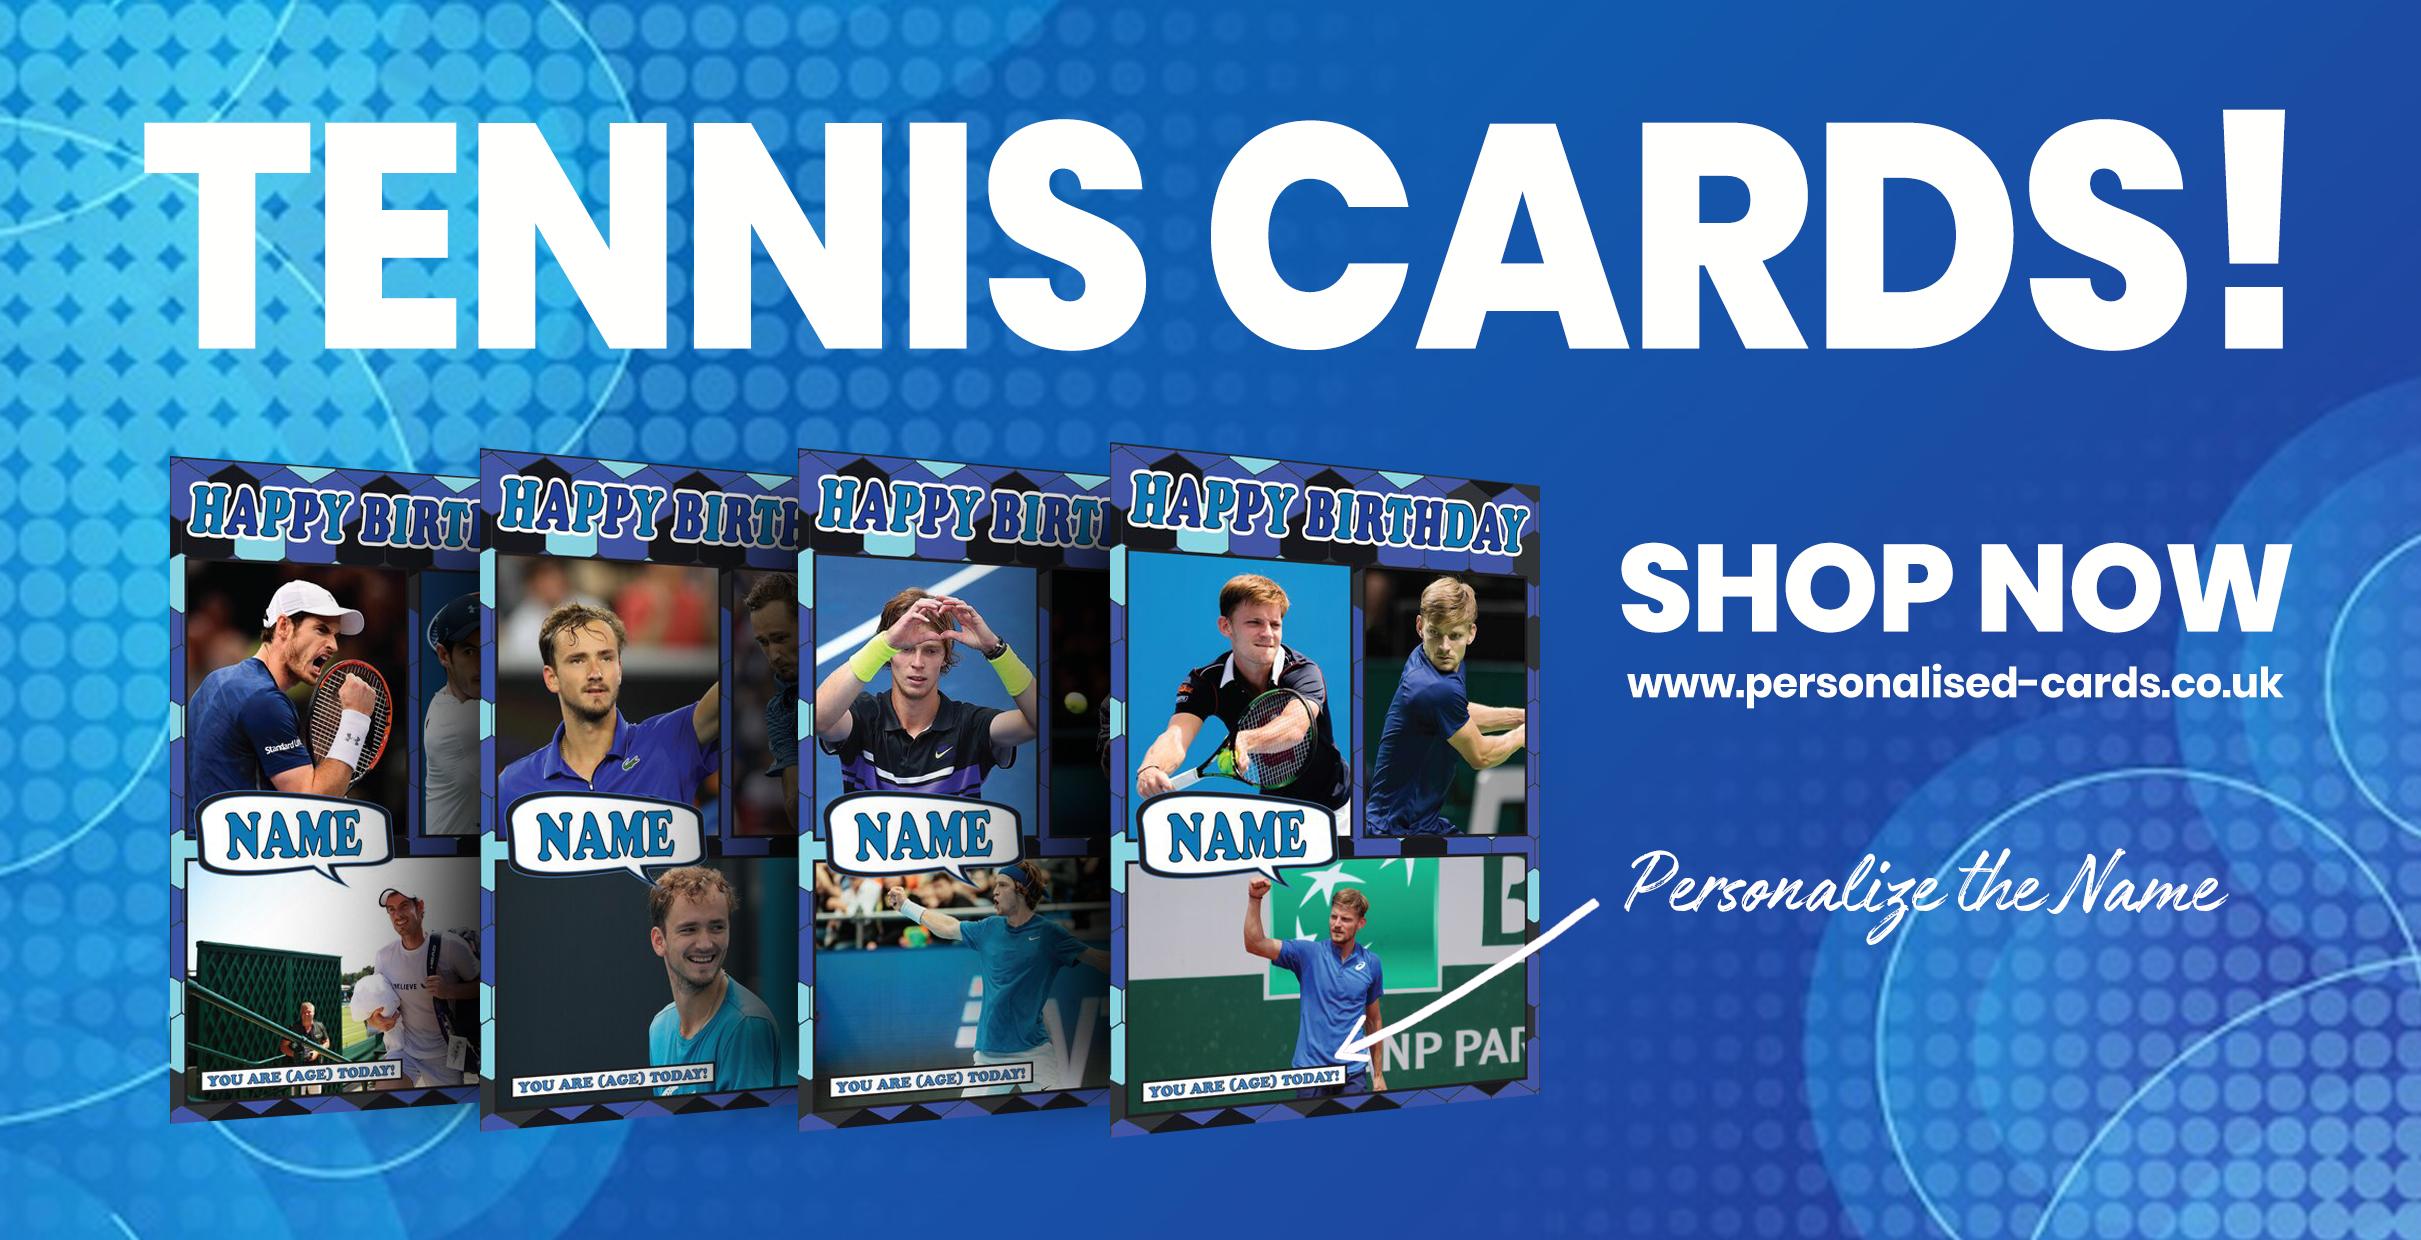 tennis-cards.jpg